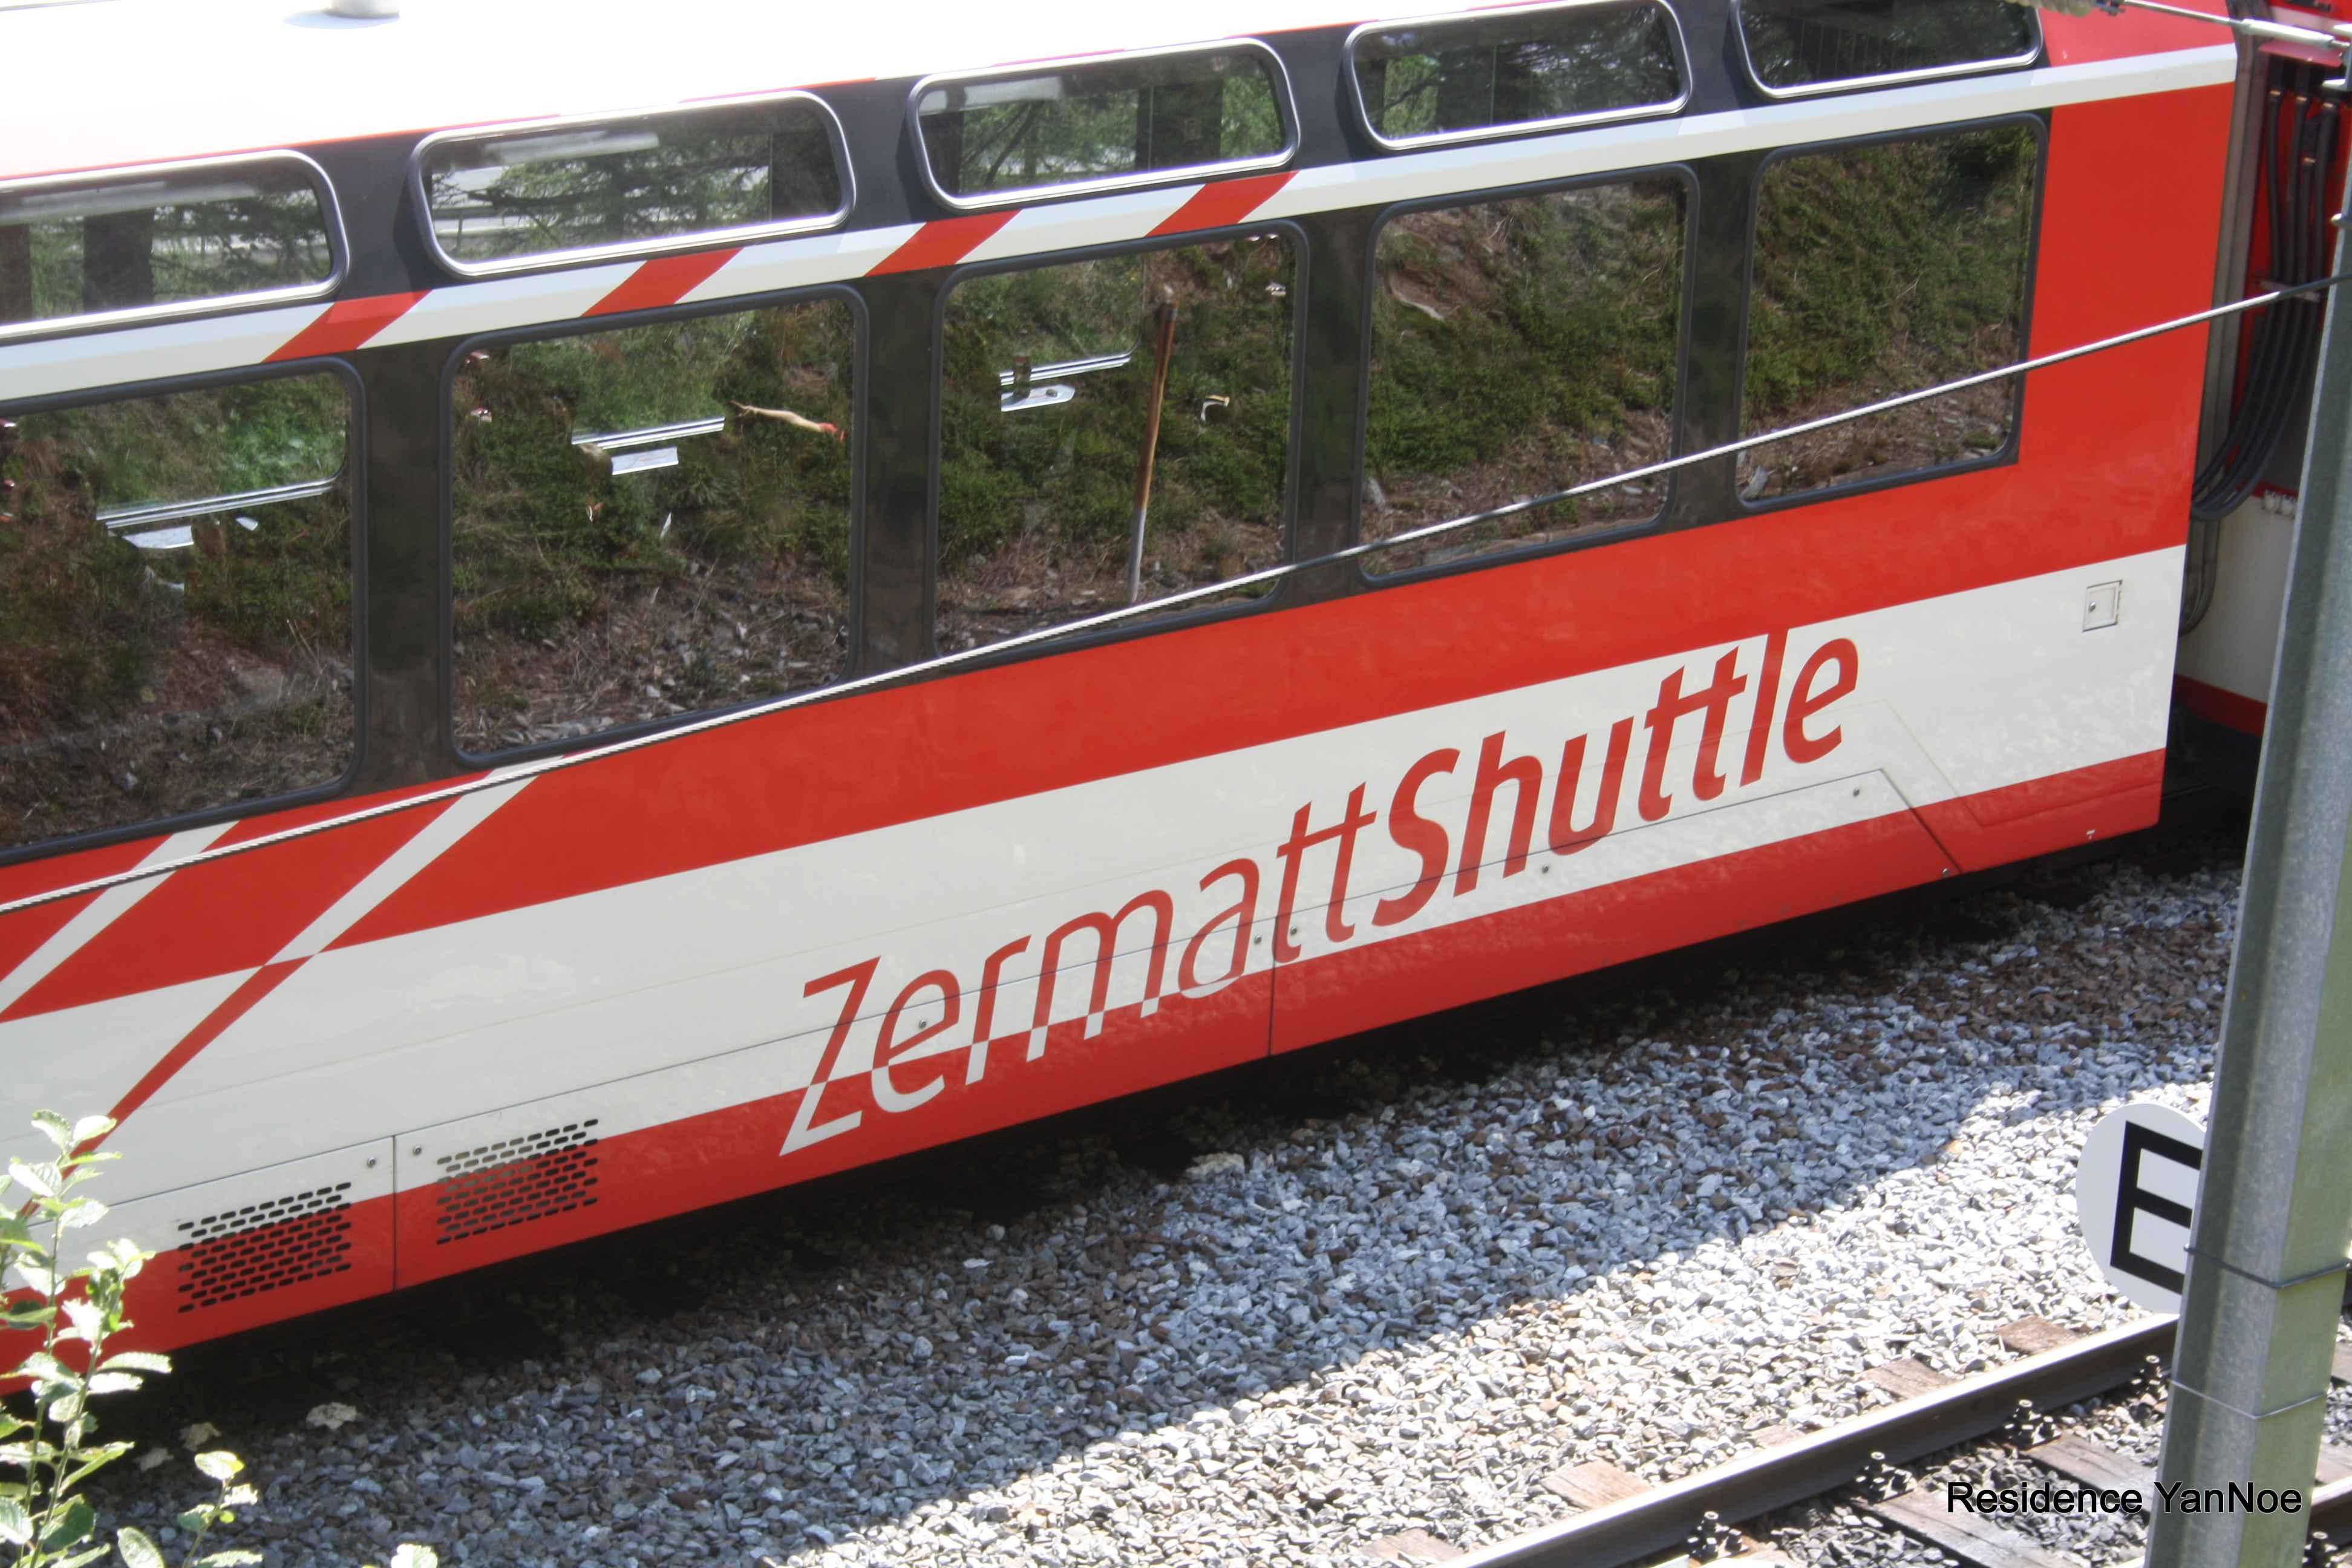 Zermatt Shuttle